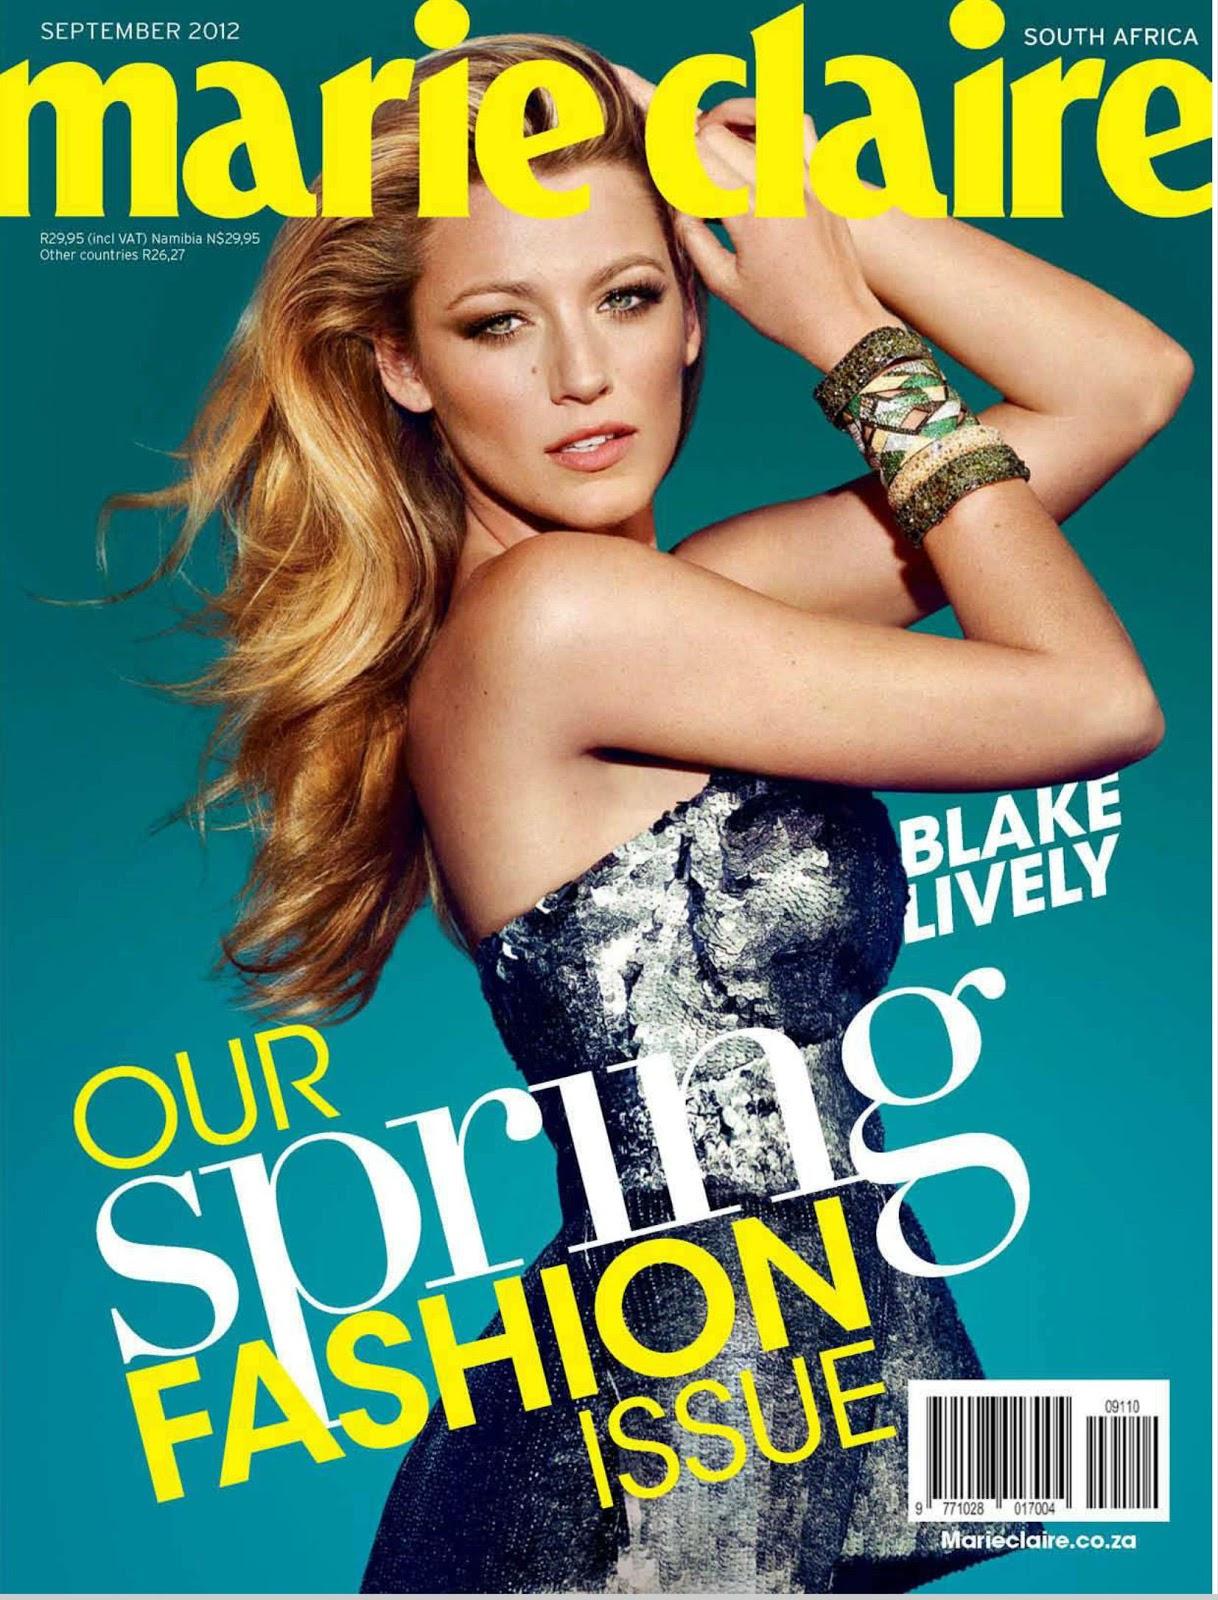 http://1.bp.blogspot.com/-g_qbbwBtPOs/UIrT89iK8NI/AAAAAAAAEFc/8GYh9olxFmo/s1600/blake+lively+marie+claire.JPG